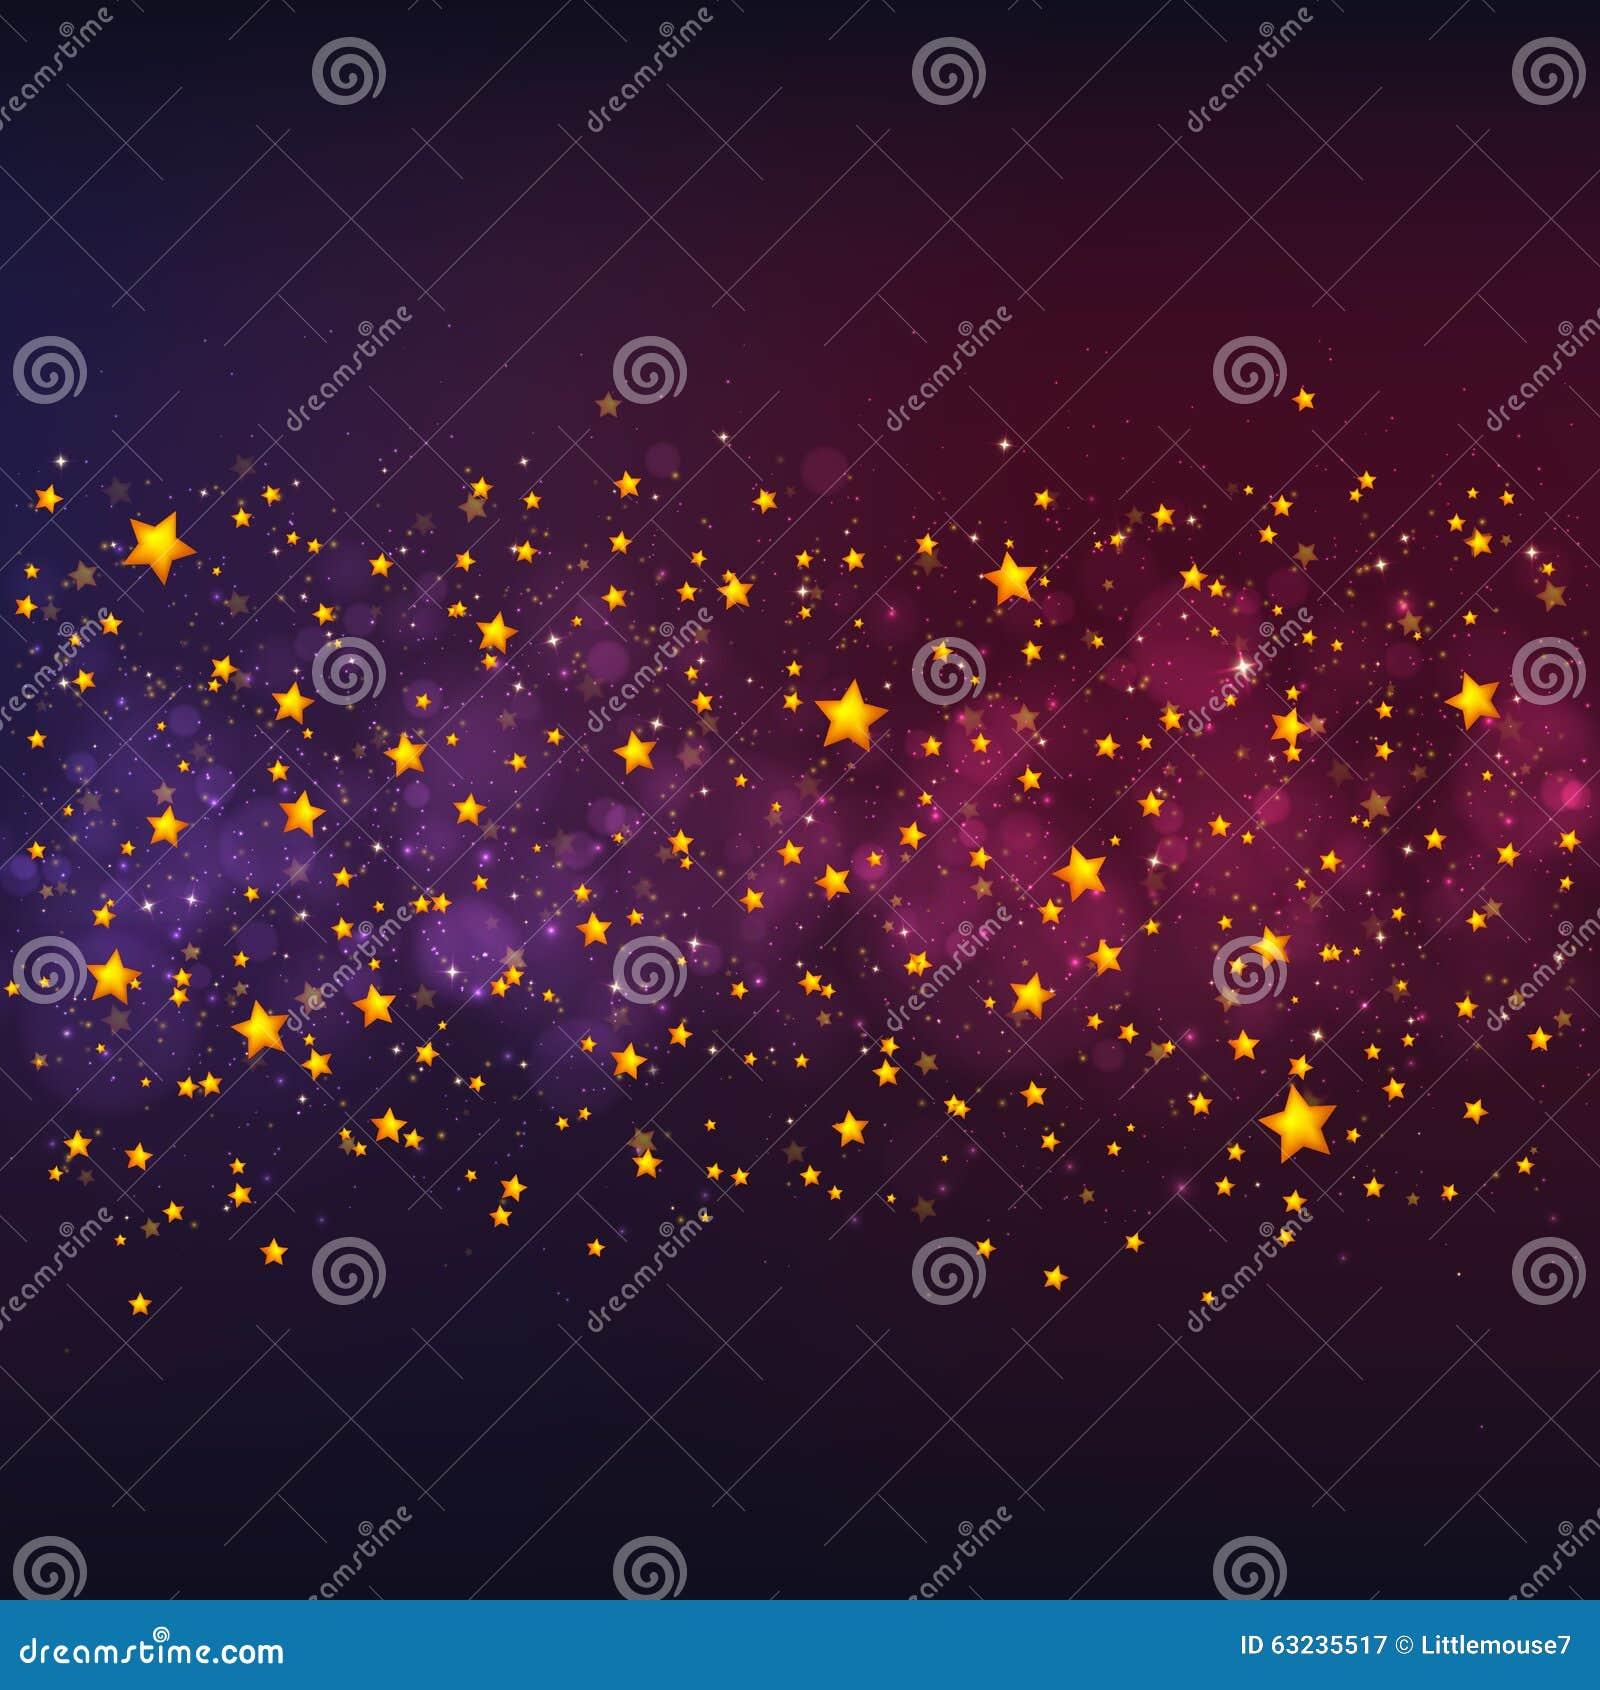 purple and gold stars - photo #40